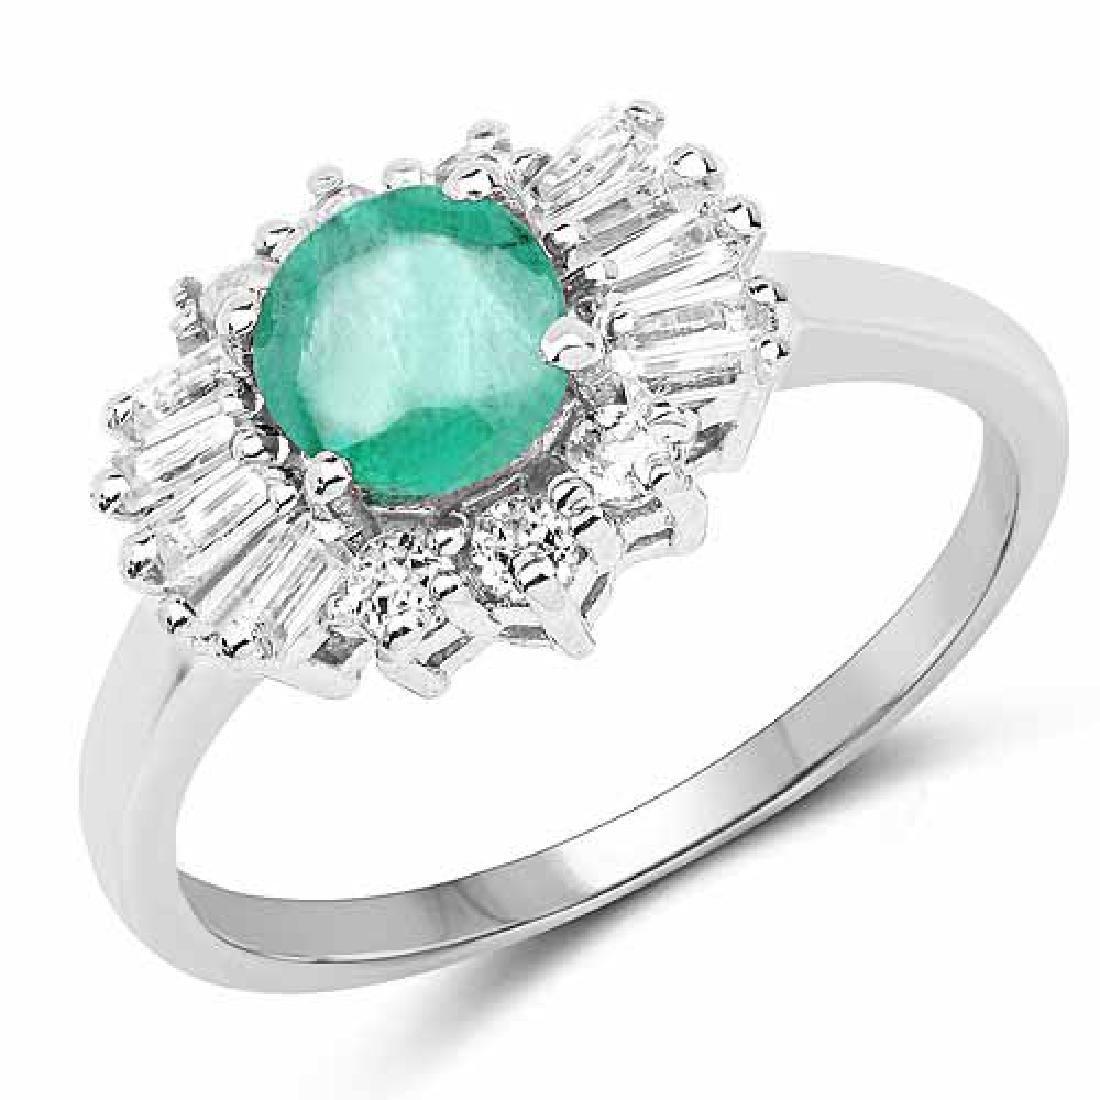 1.59 Carat Genuine Zambian Emerald and White Topaz .925